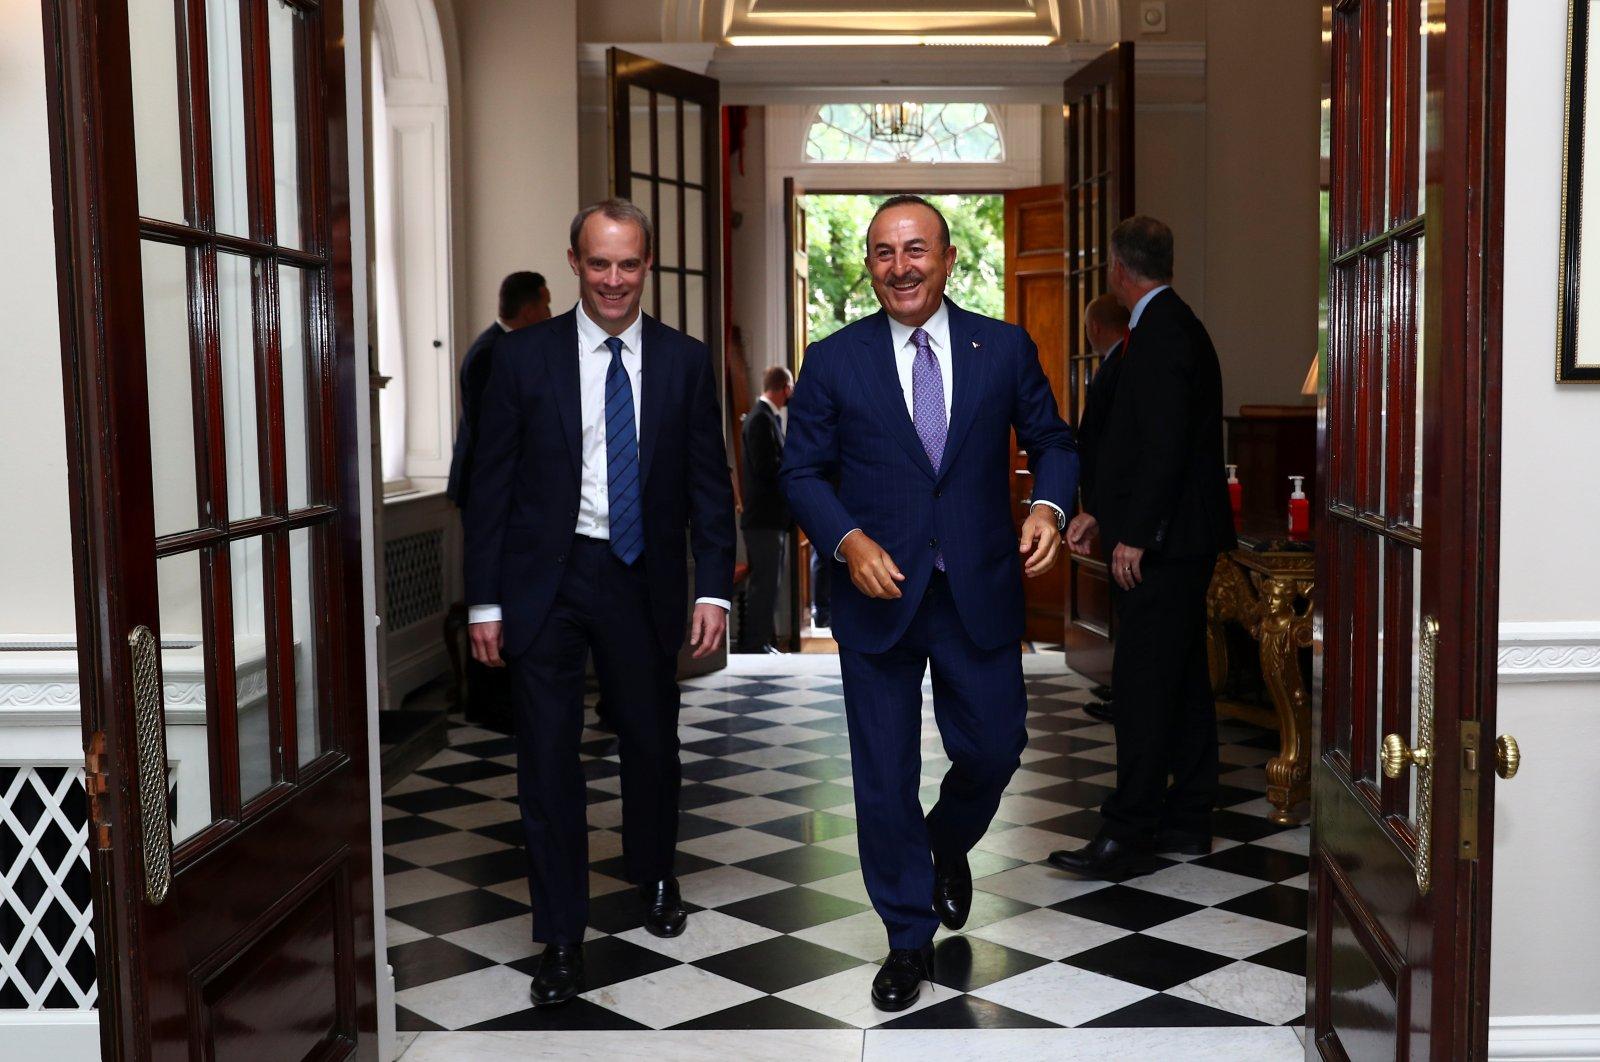 Britain's Foreign Secretary Dominic Raab (L) and Turkey's Foreign Minister Mevlüt Çavuşoğlu arrive for a meeting, London, Britain, July 8, 2020. (Reuters Photo)